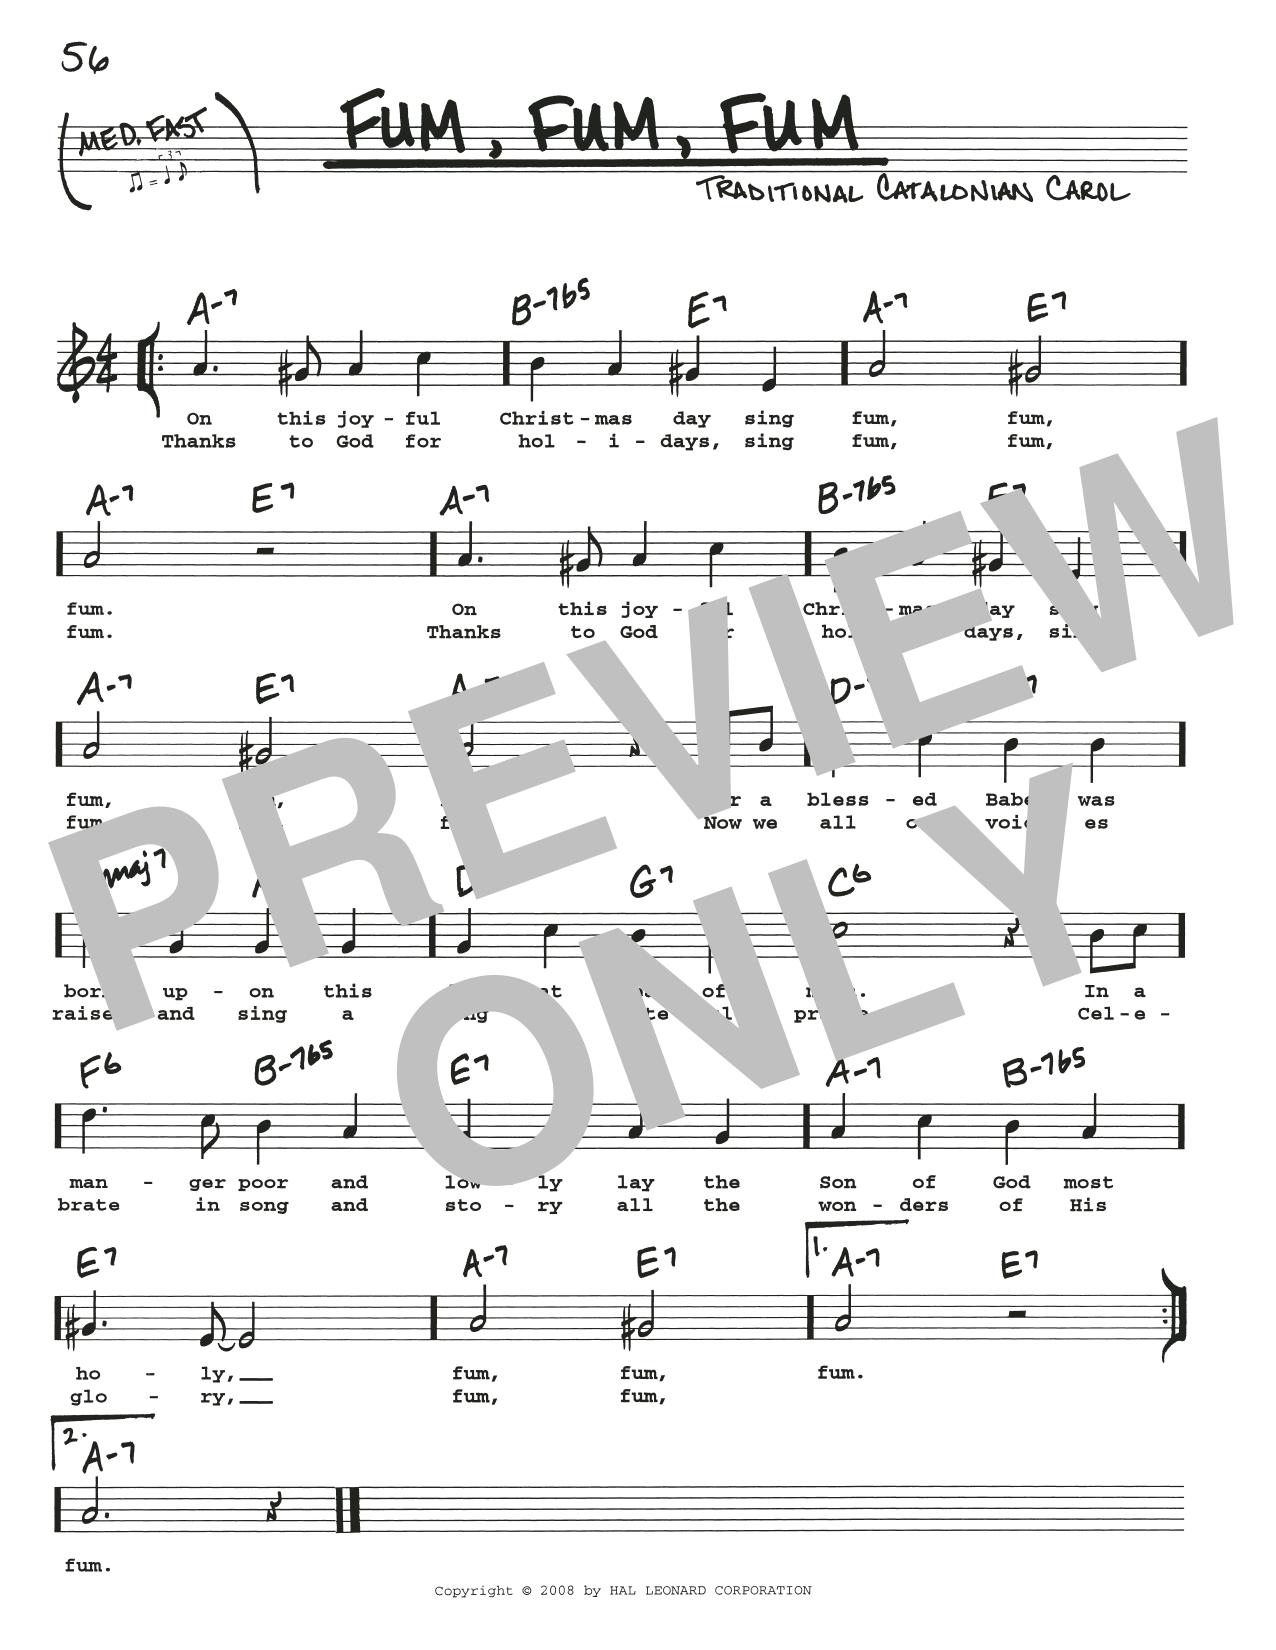 Traditional Carol Fum, Fum, Fum sheet music notes and chords